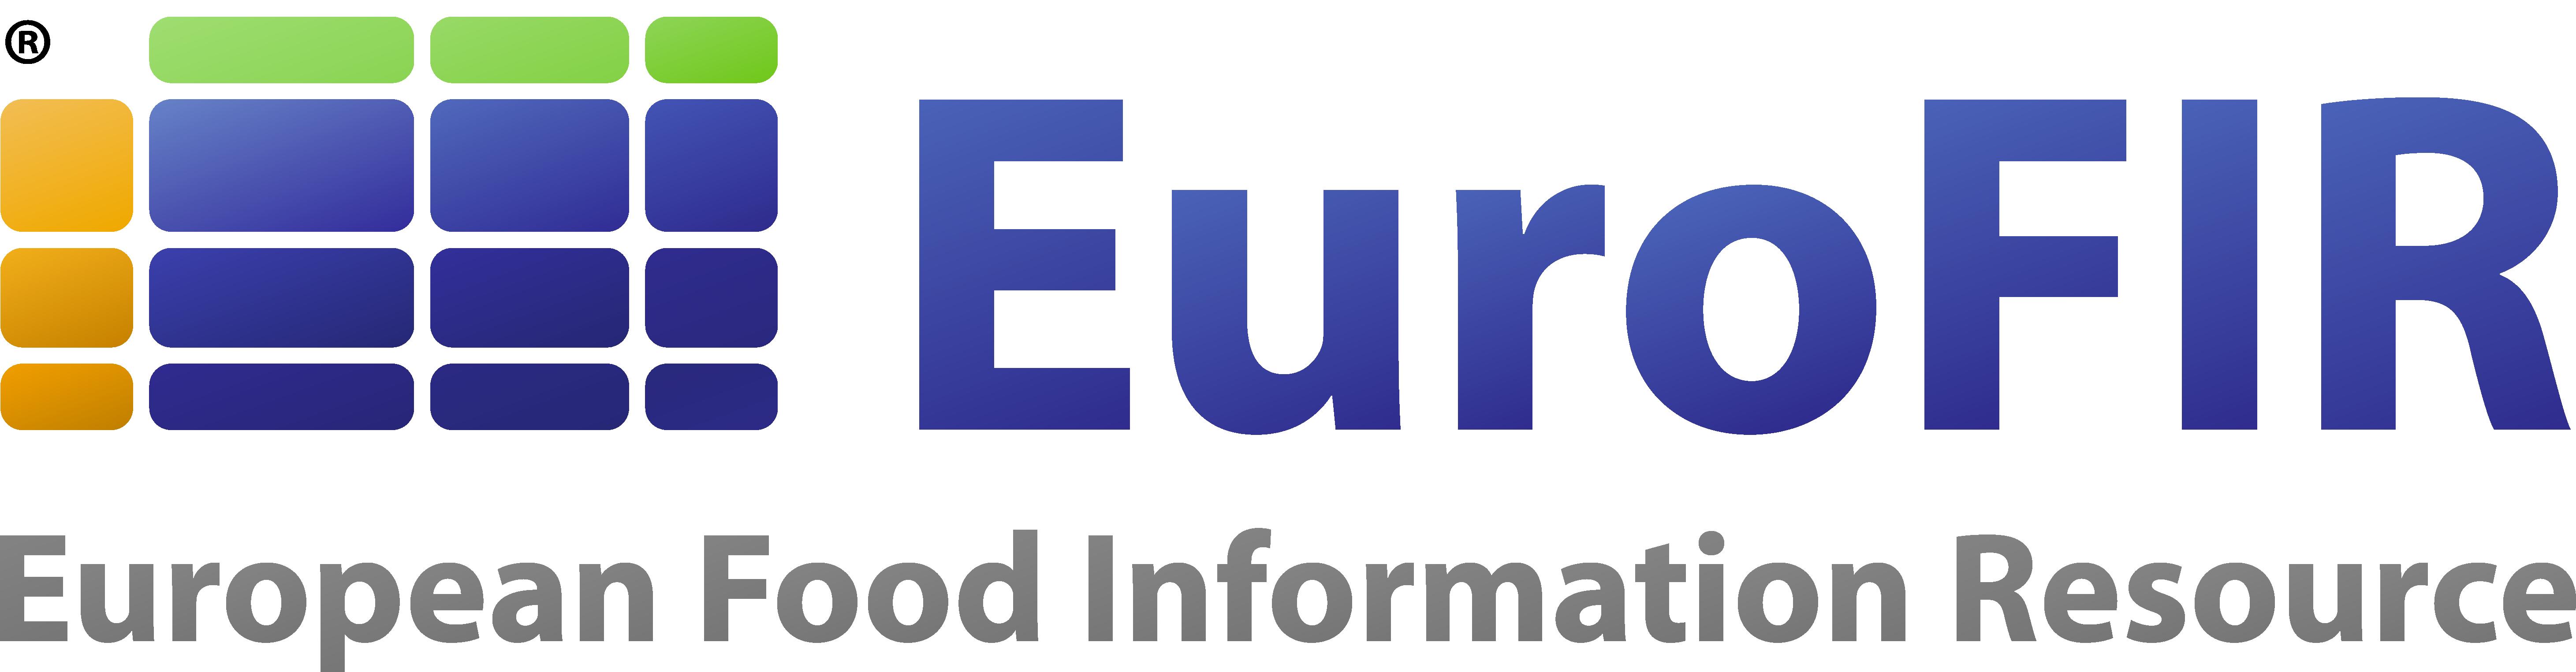 European Food Information Resource